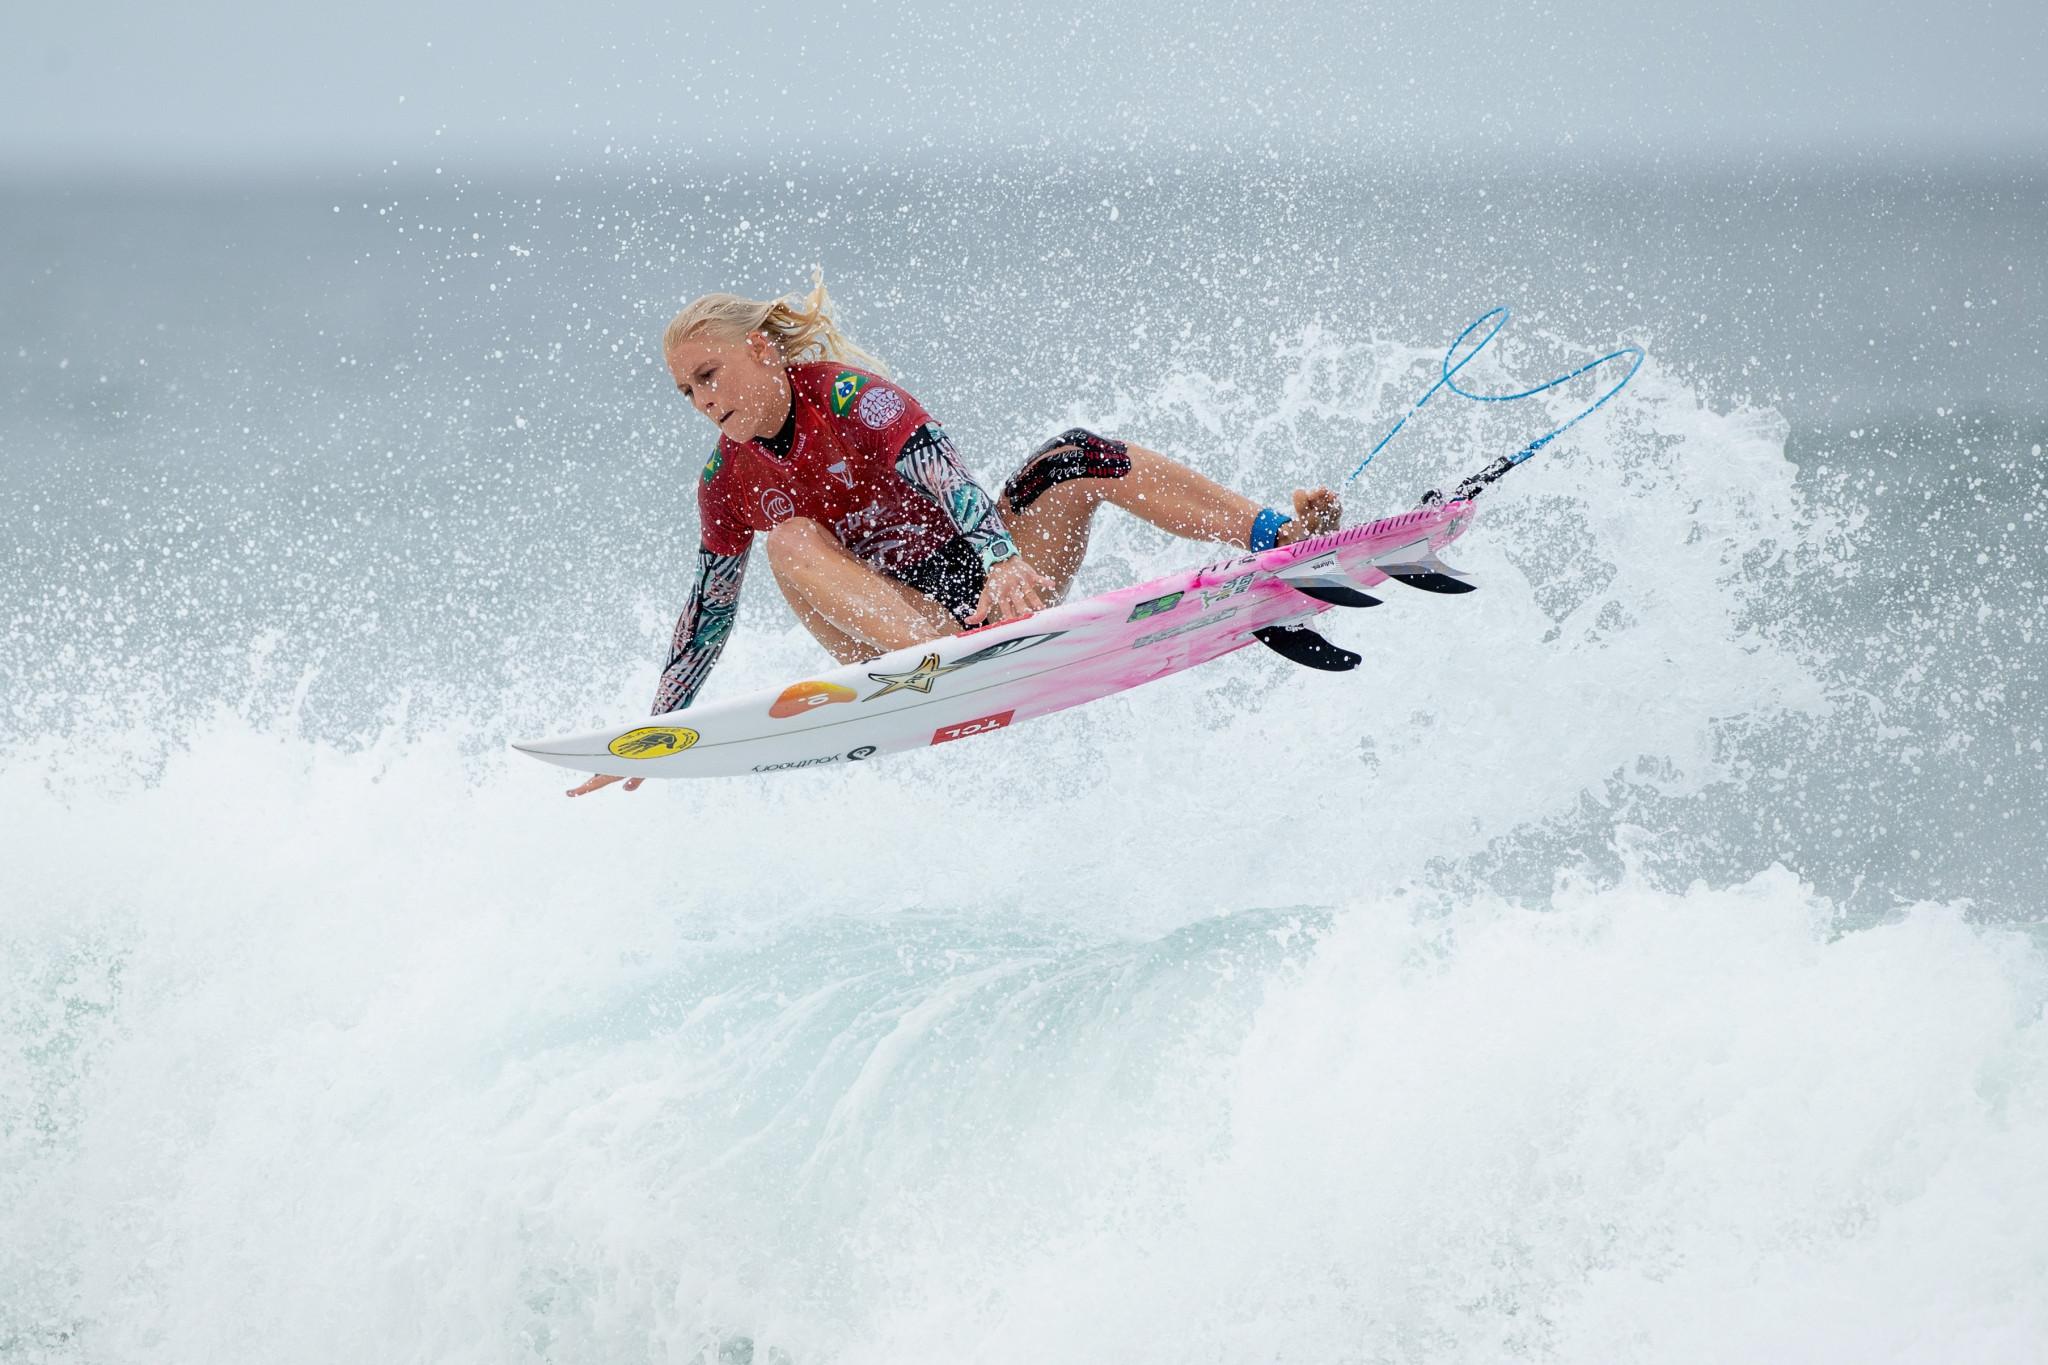 Weston-Webb dedicates World Surf League win to Macaulay family after tragedy